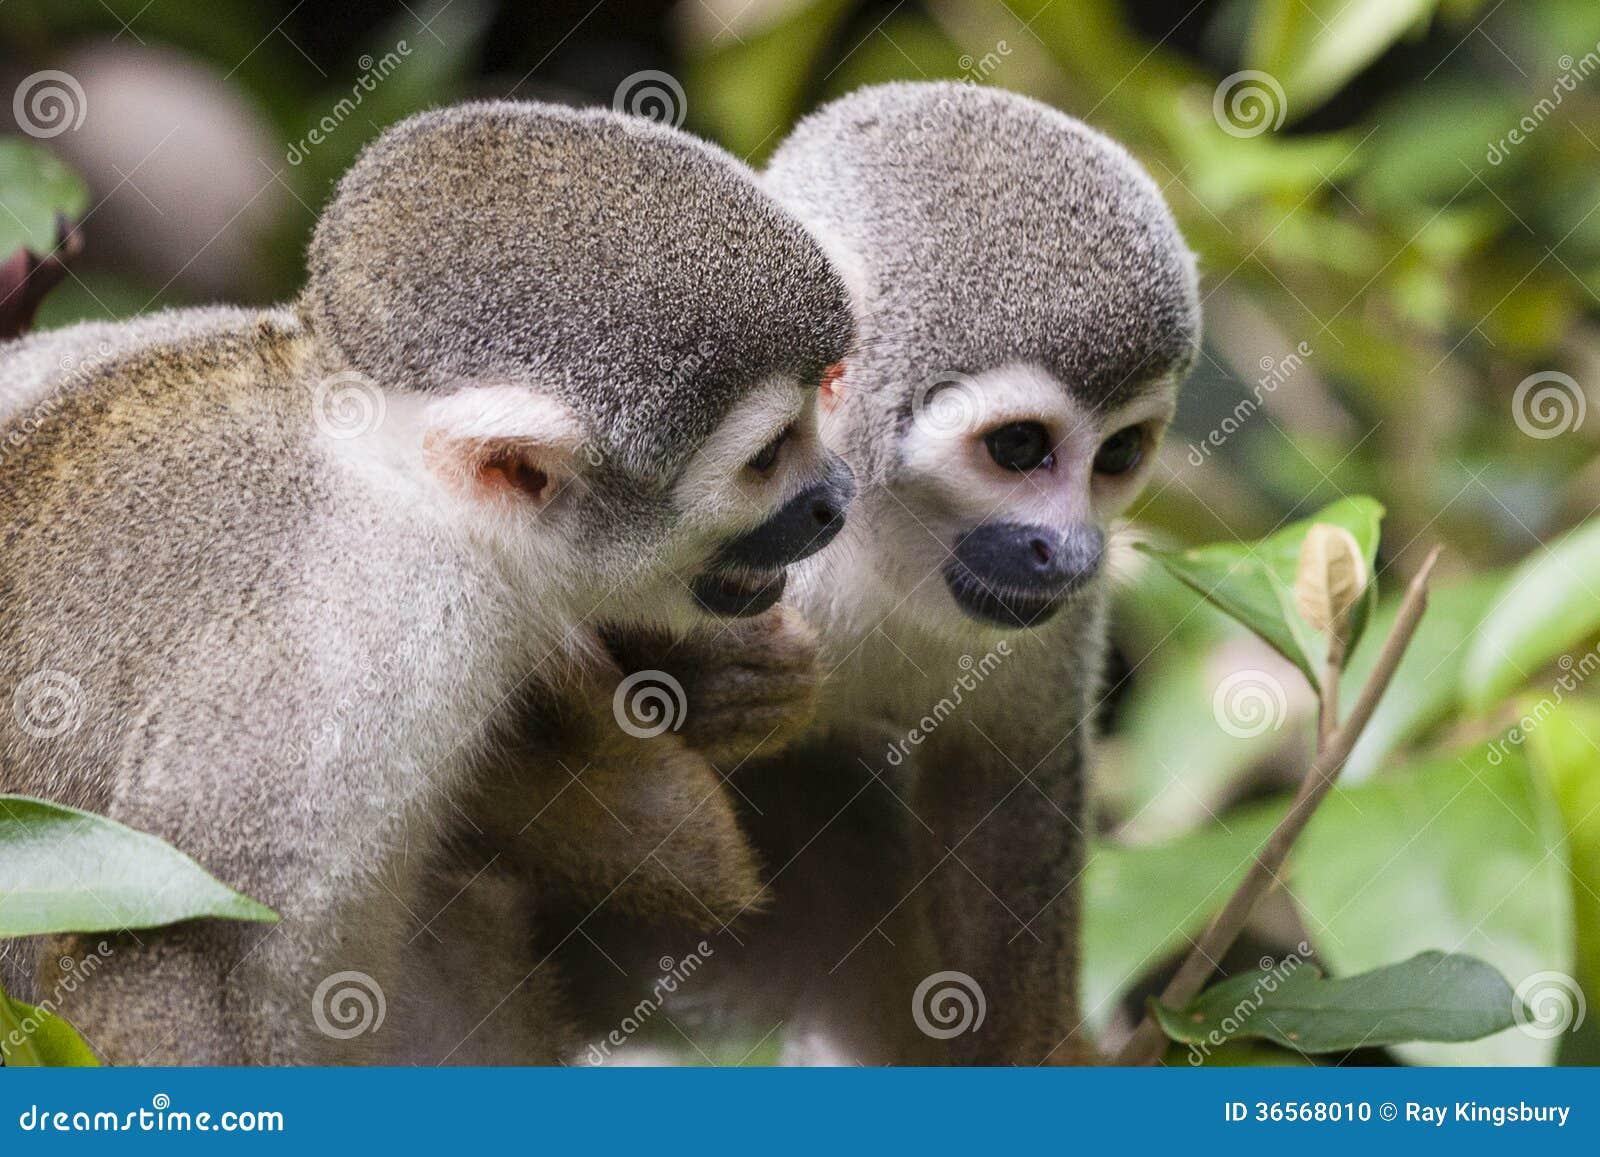 Monkey Friends Stock Photo - Image: 36568010